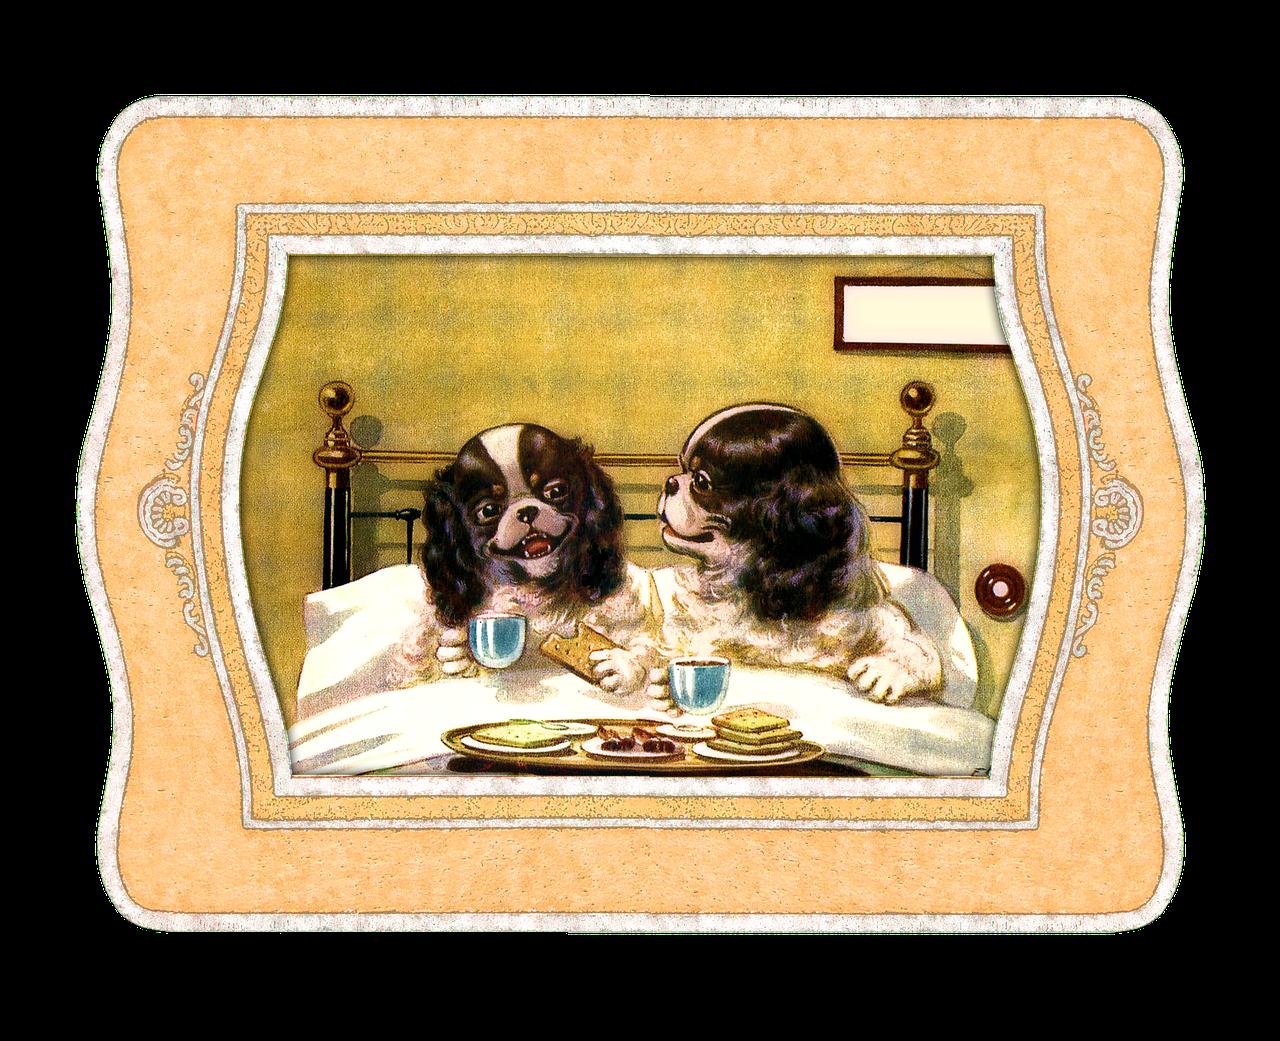 Das Hundebett – 10 Qualitätsmerkmale